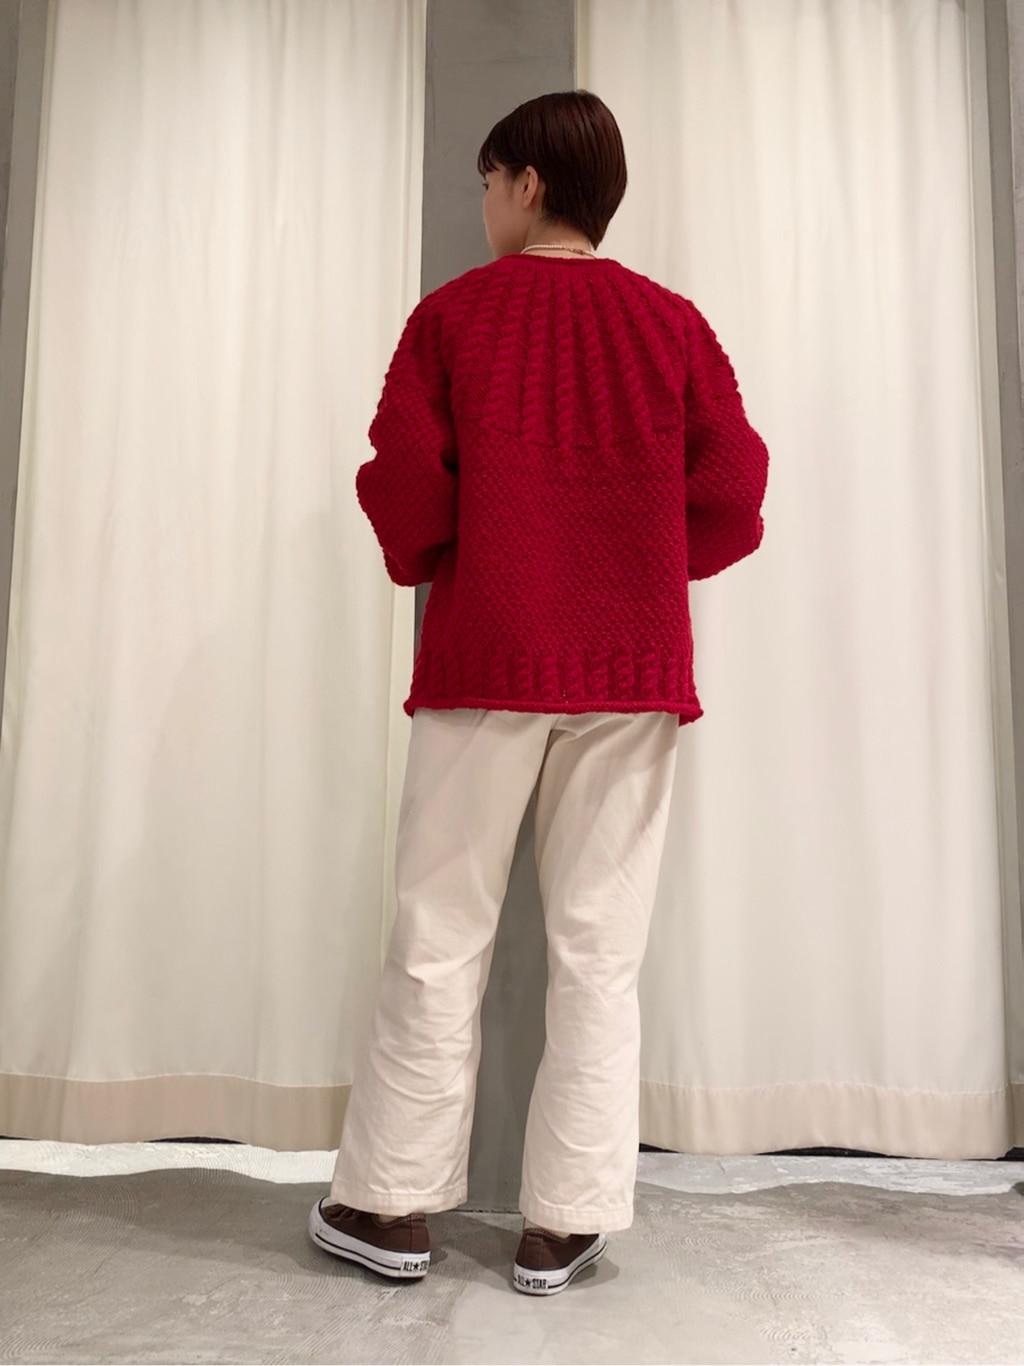 - CHILD WOMAN CHILD WOMAN , PAR ICI ルミネ横浜 身長:158cm 2020.10.12